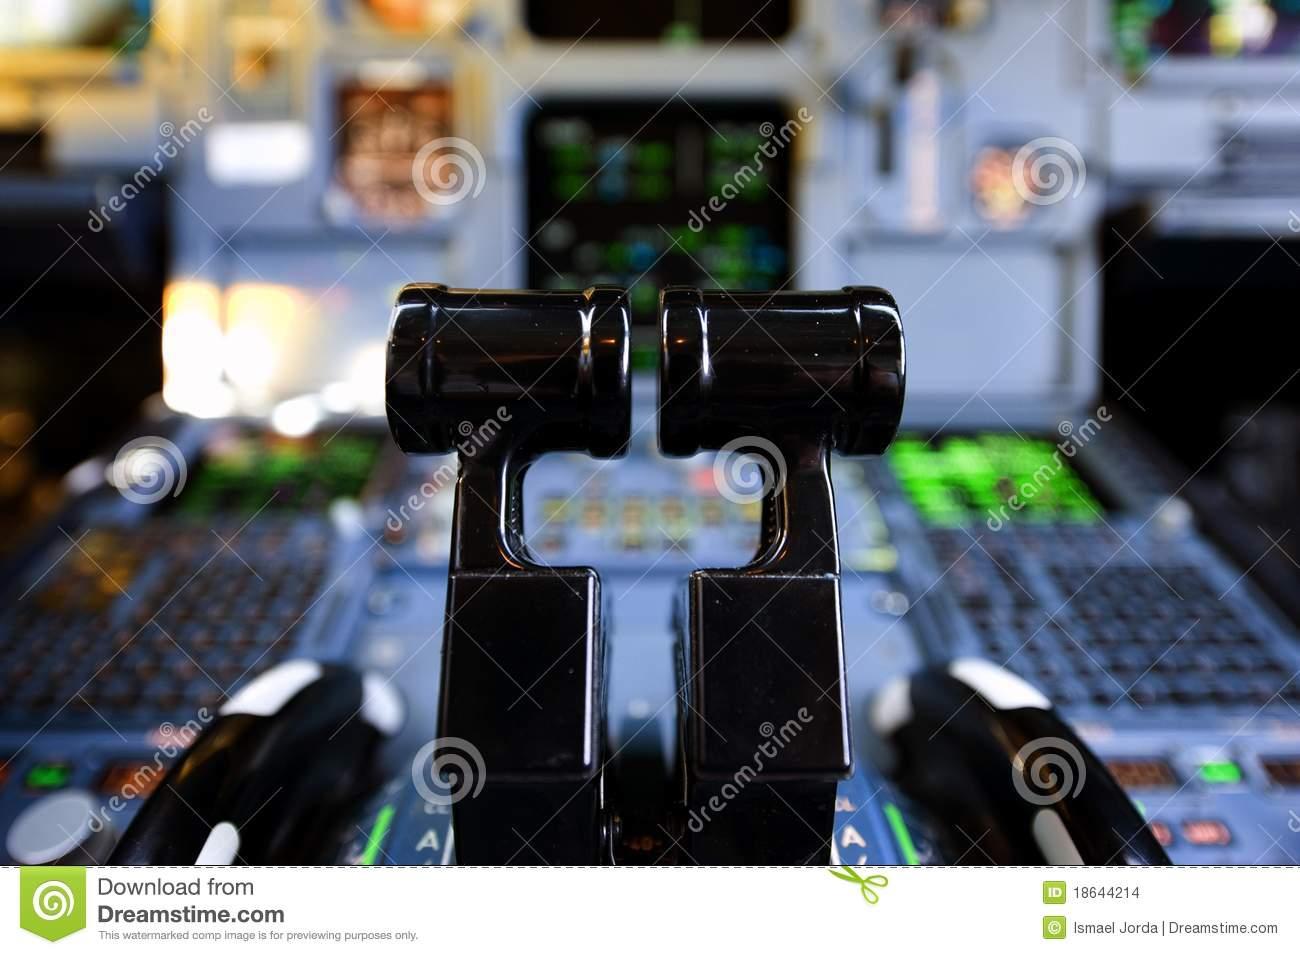 Aircraft Thrust Levers Stock Photo.